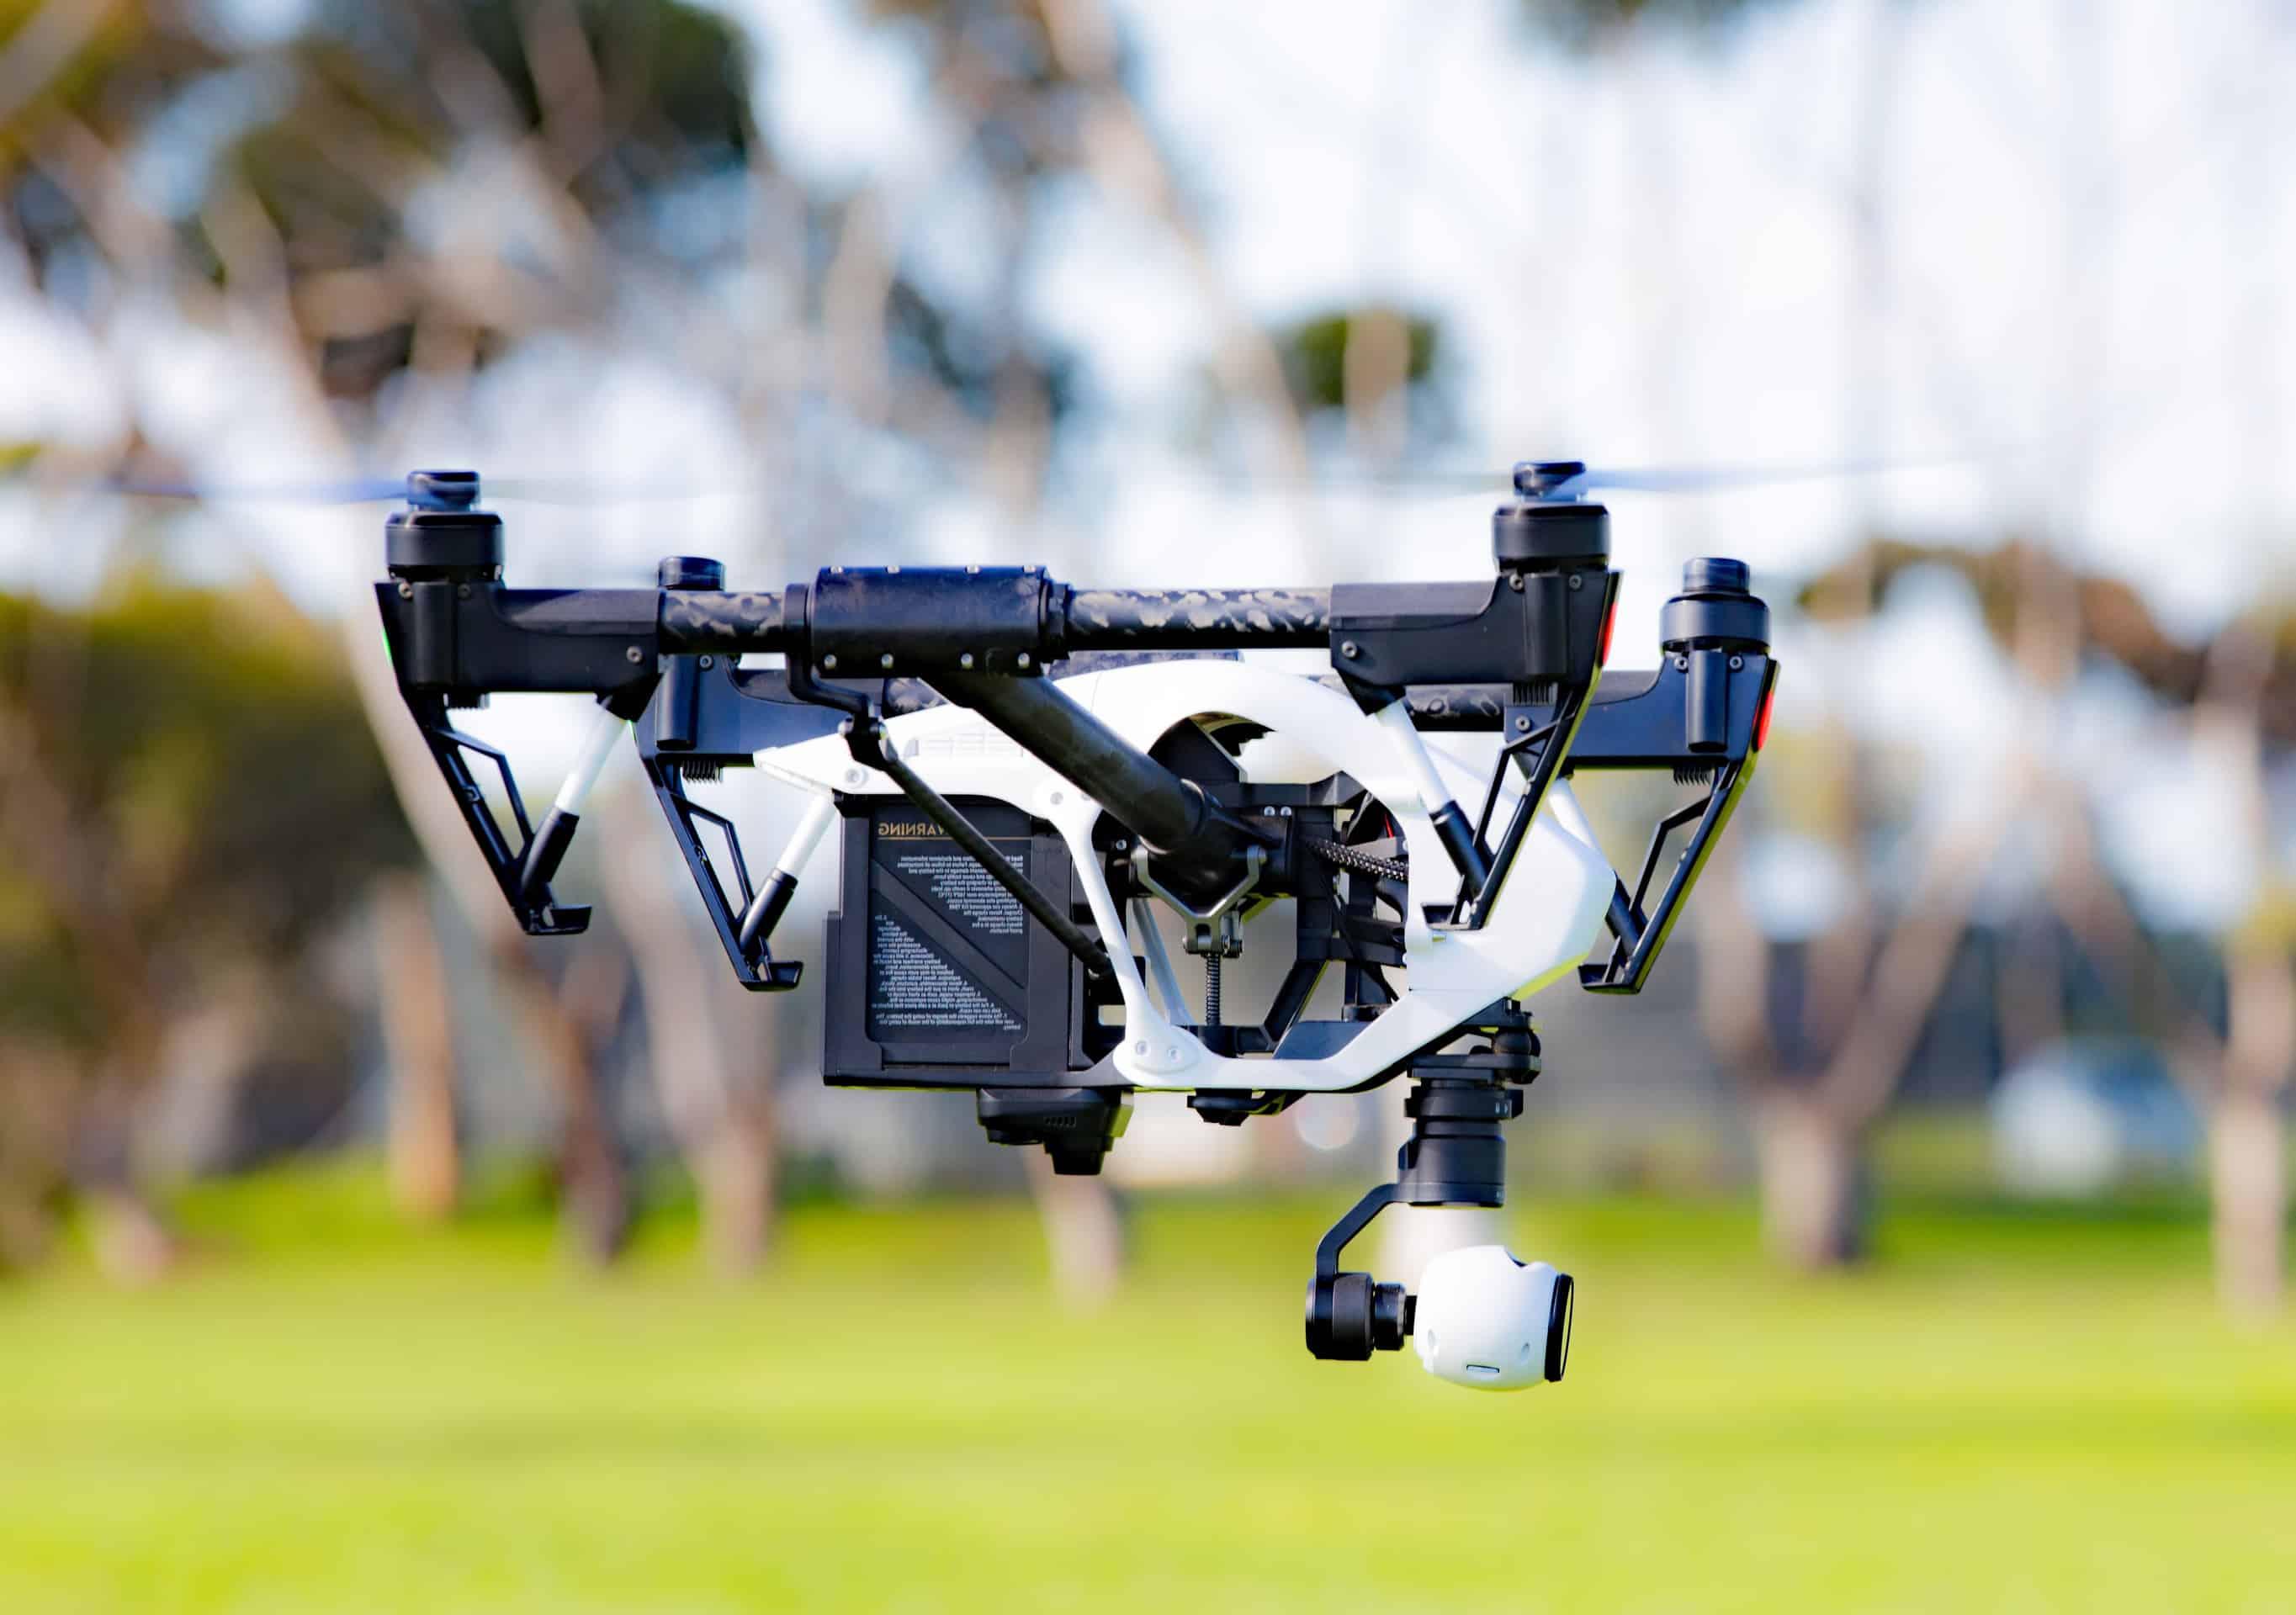 Drone FAA Part 107